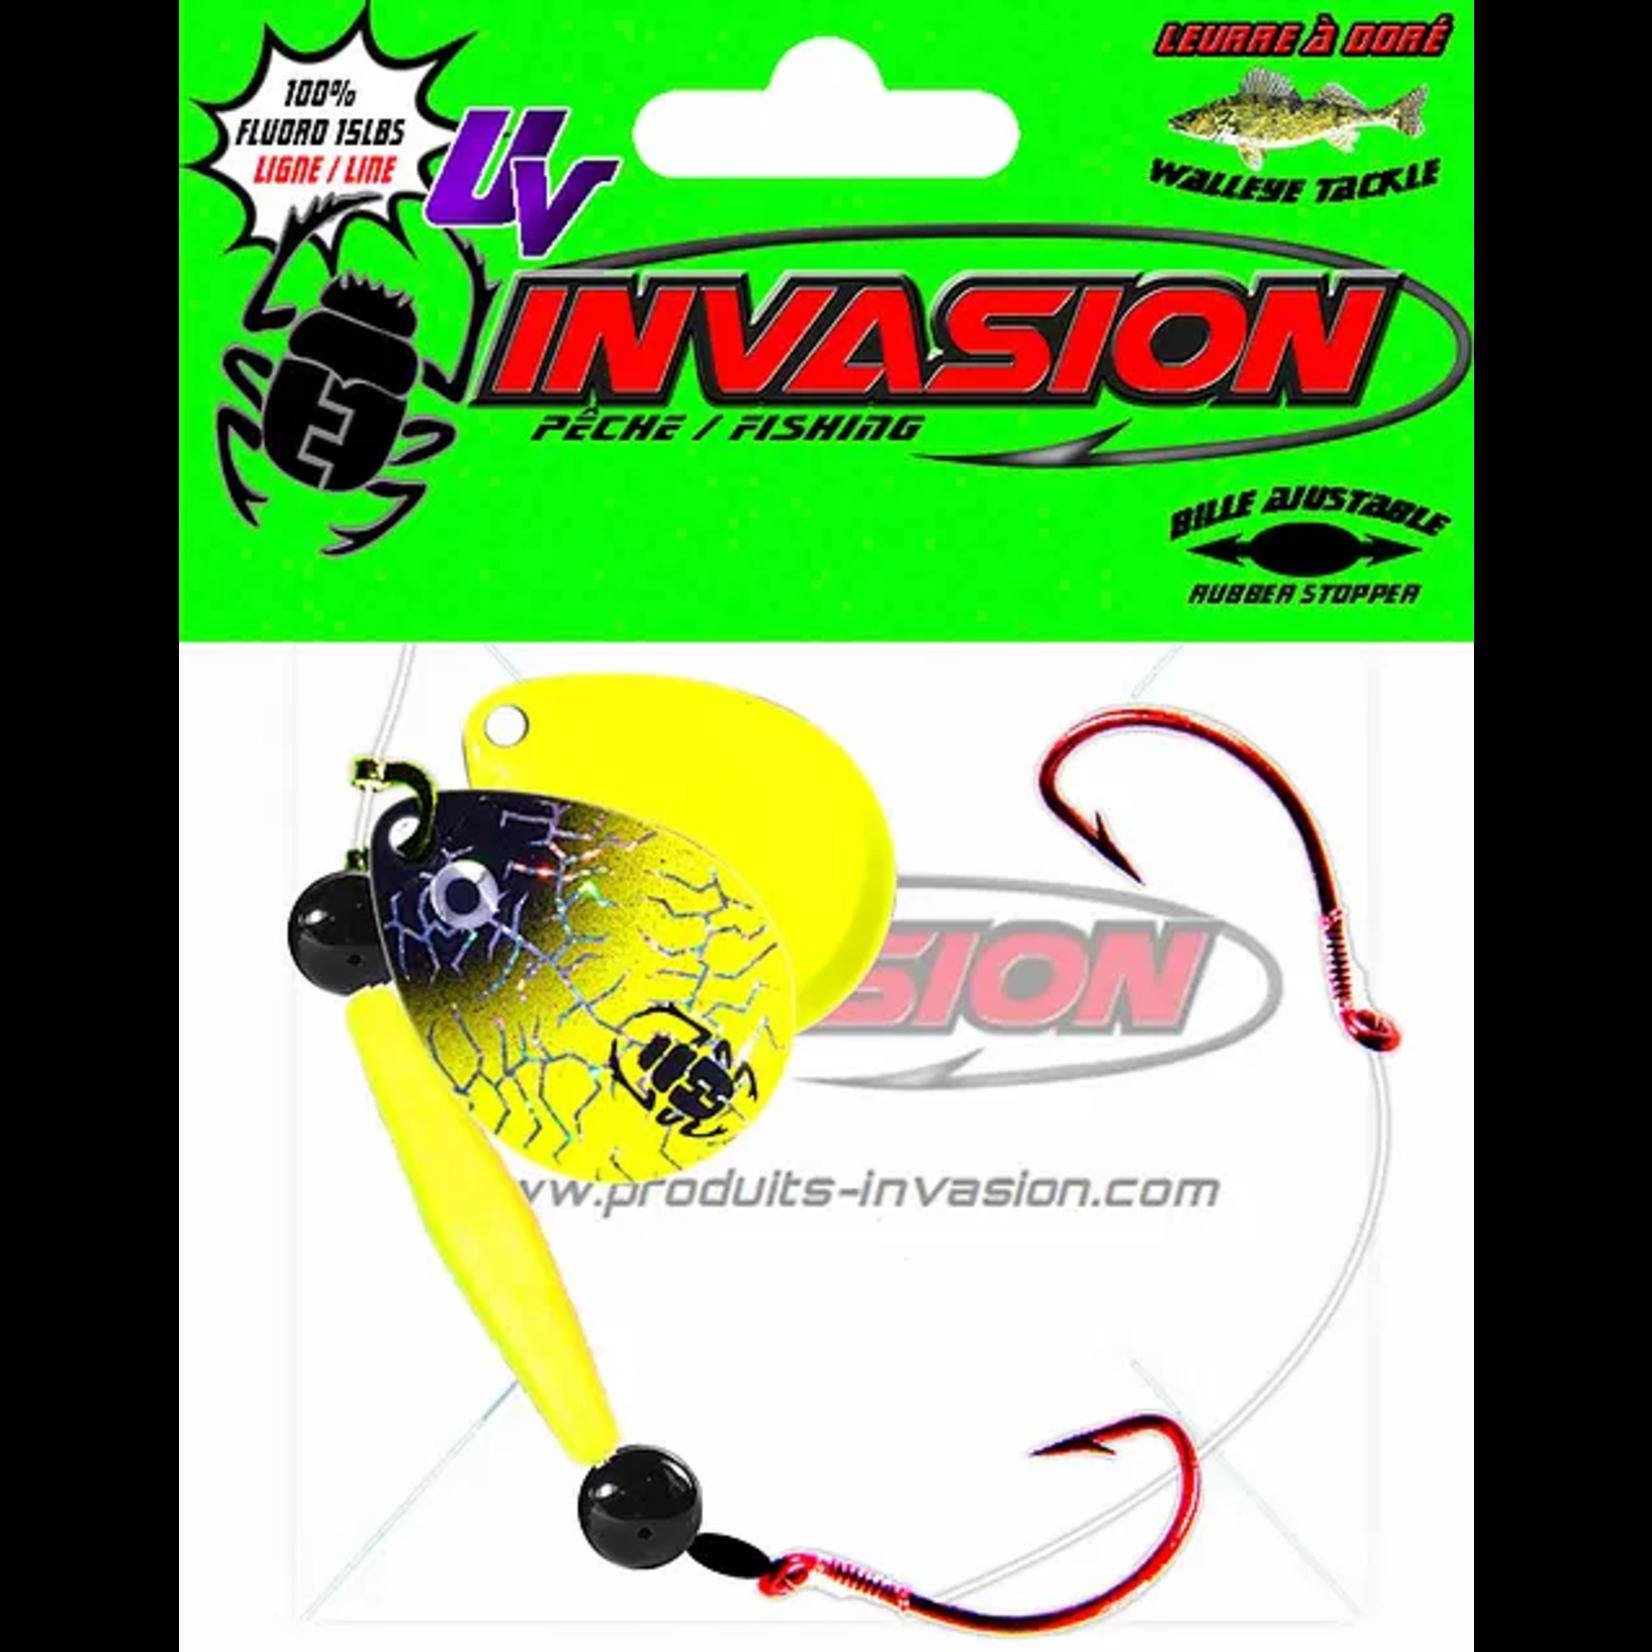 Invasion Series 02 Invasion Float Harness